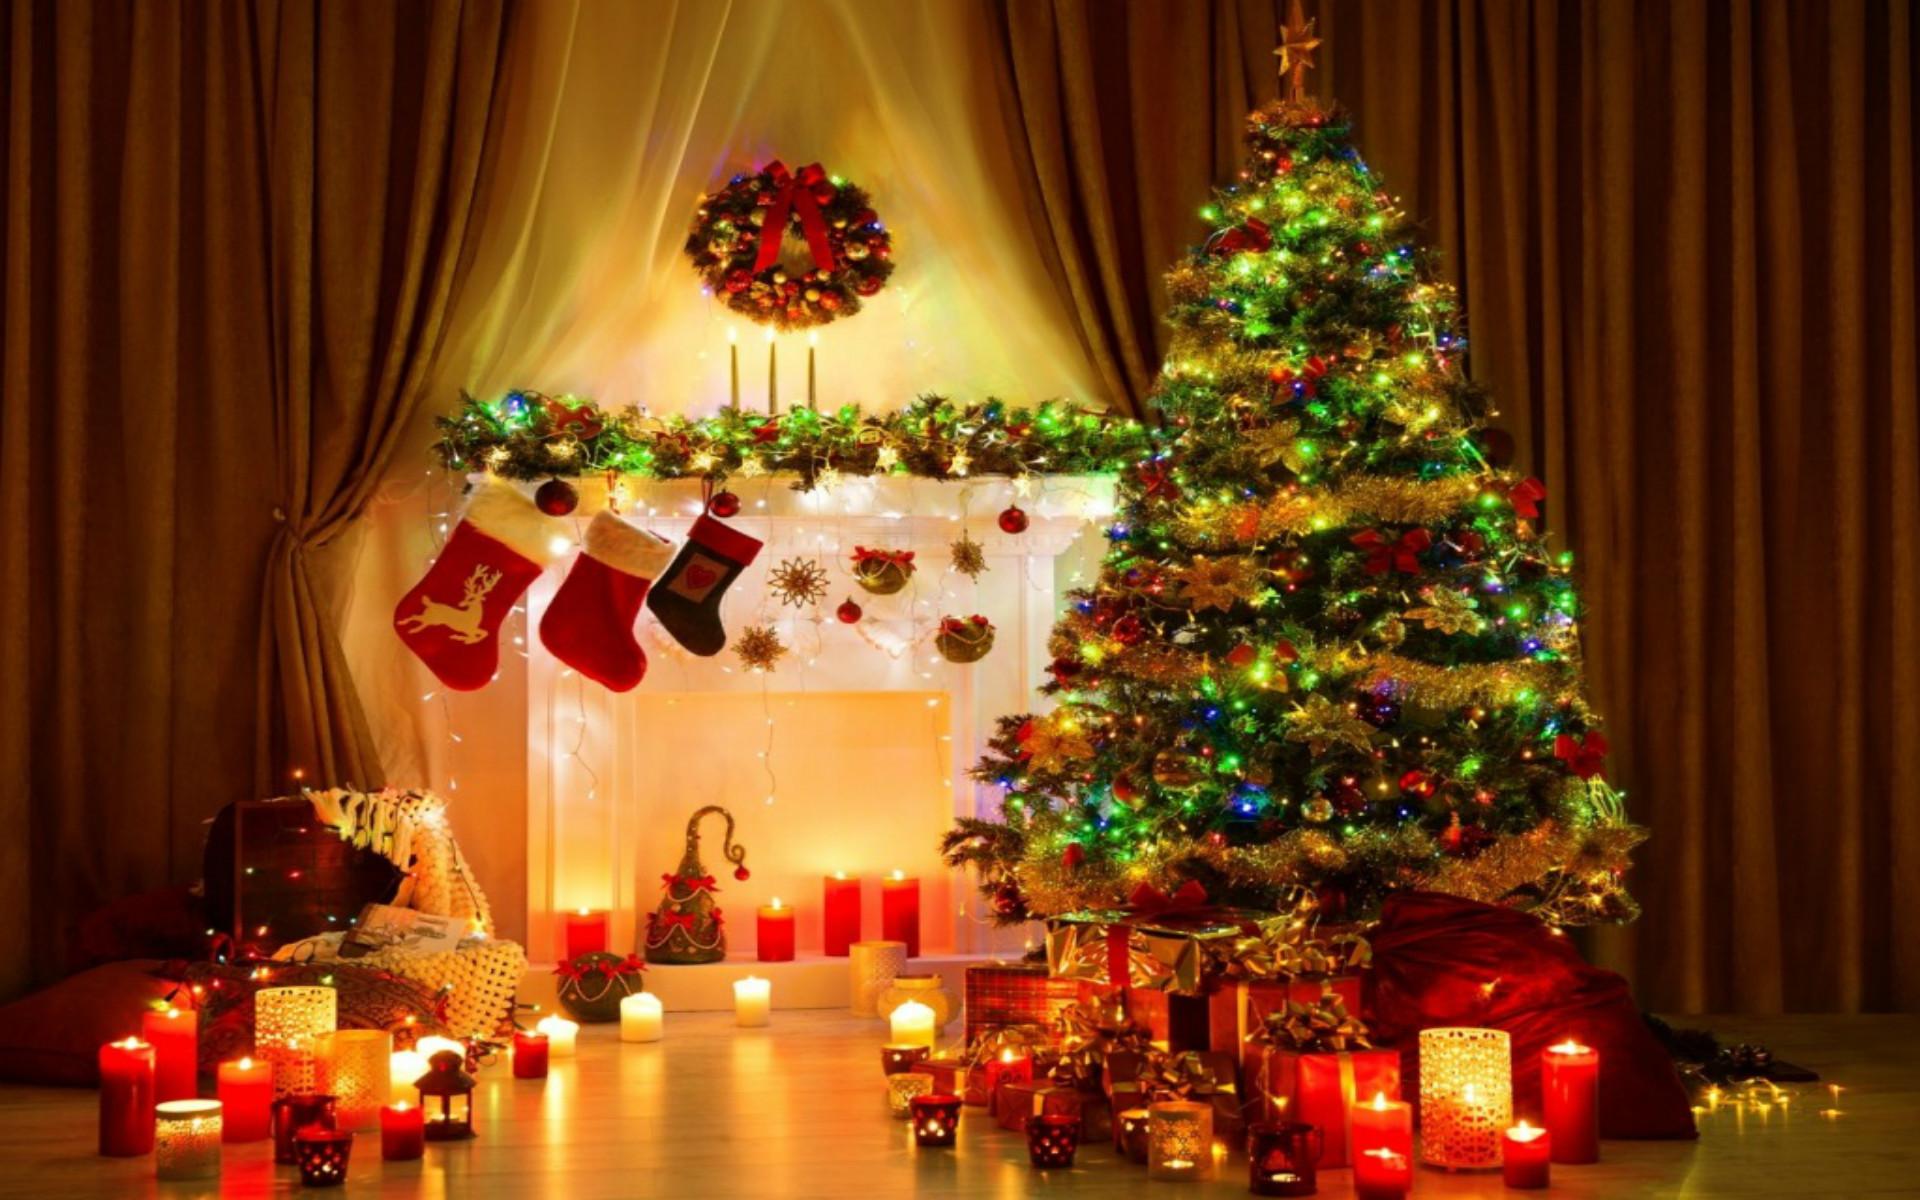 Wallpaper Desktop Christmas (57+ images)